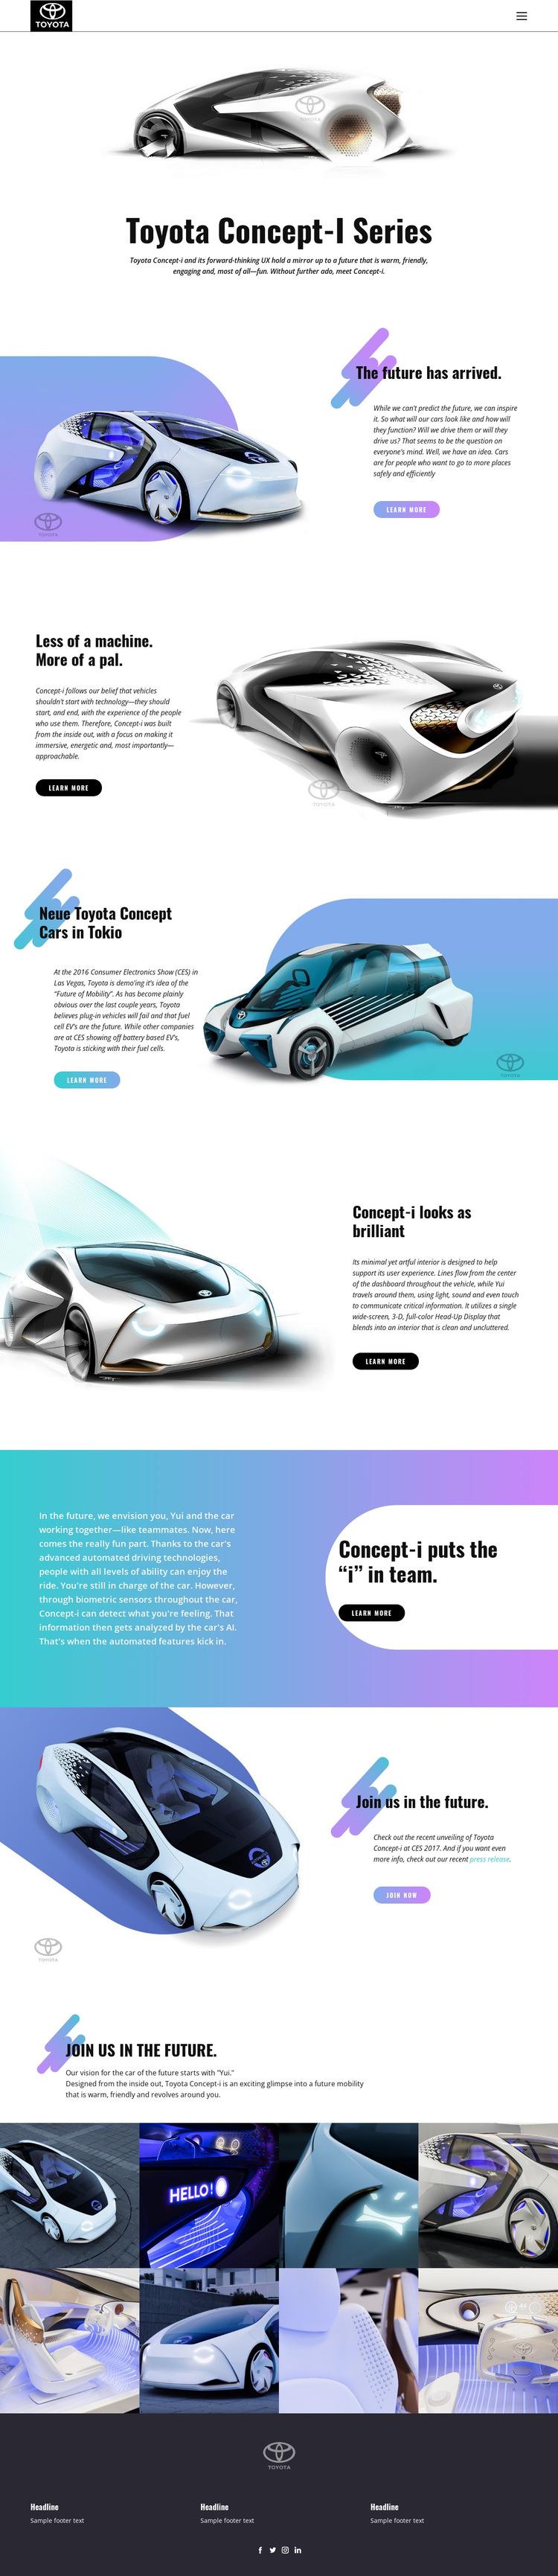 Advanced innovation cars HTML5 Template